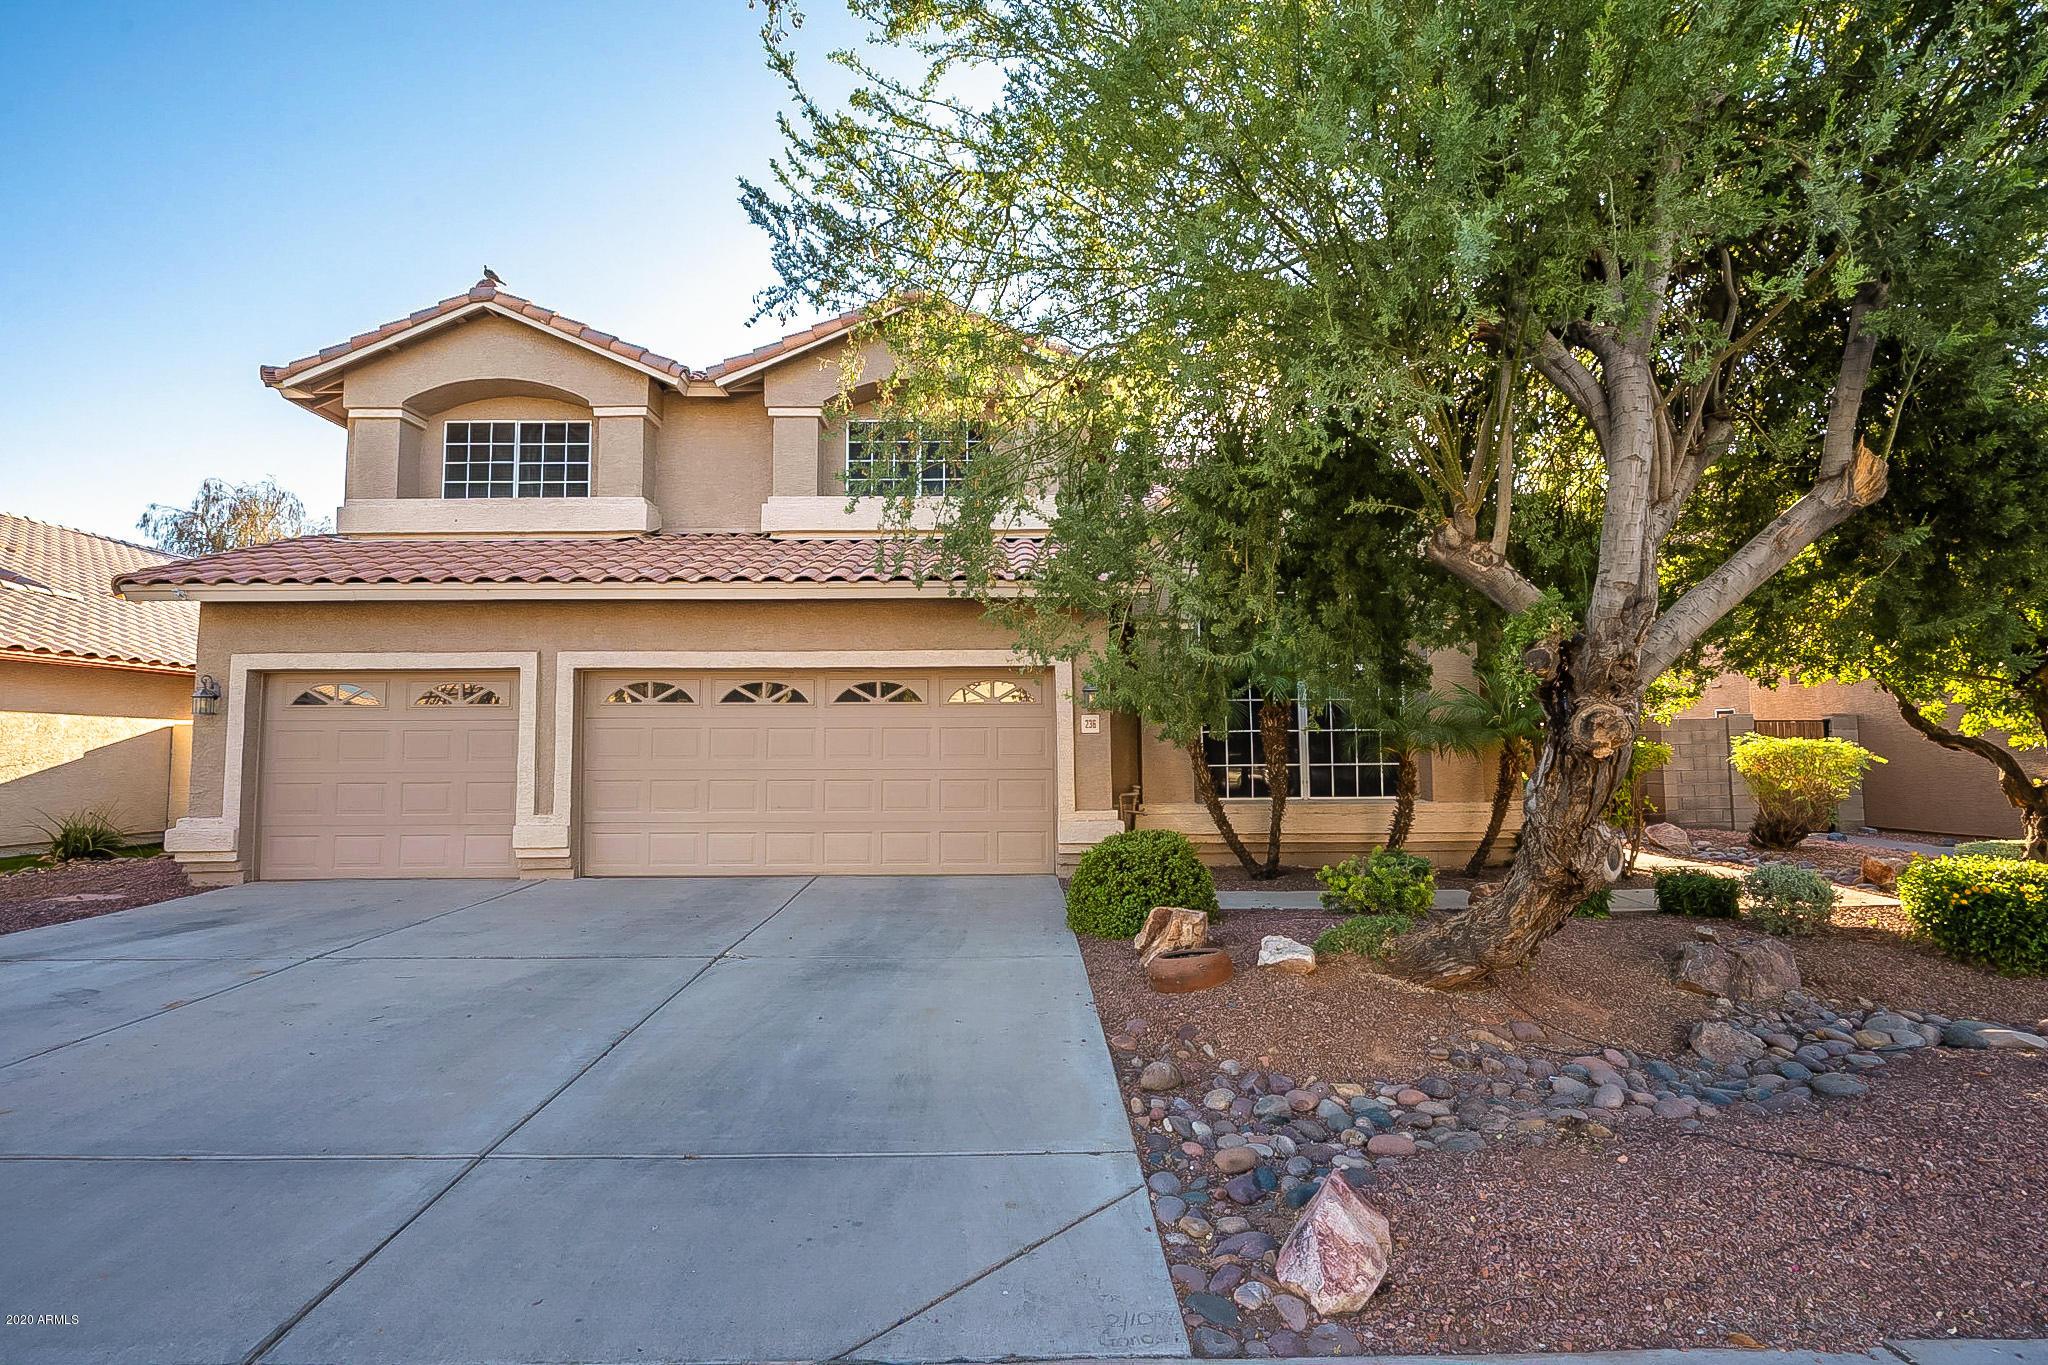 Photo of 236 S SANDSTONE Street, Gilbert, AZ 85296